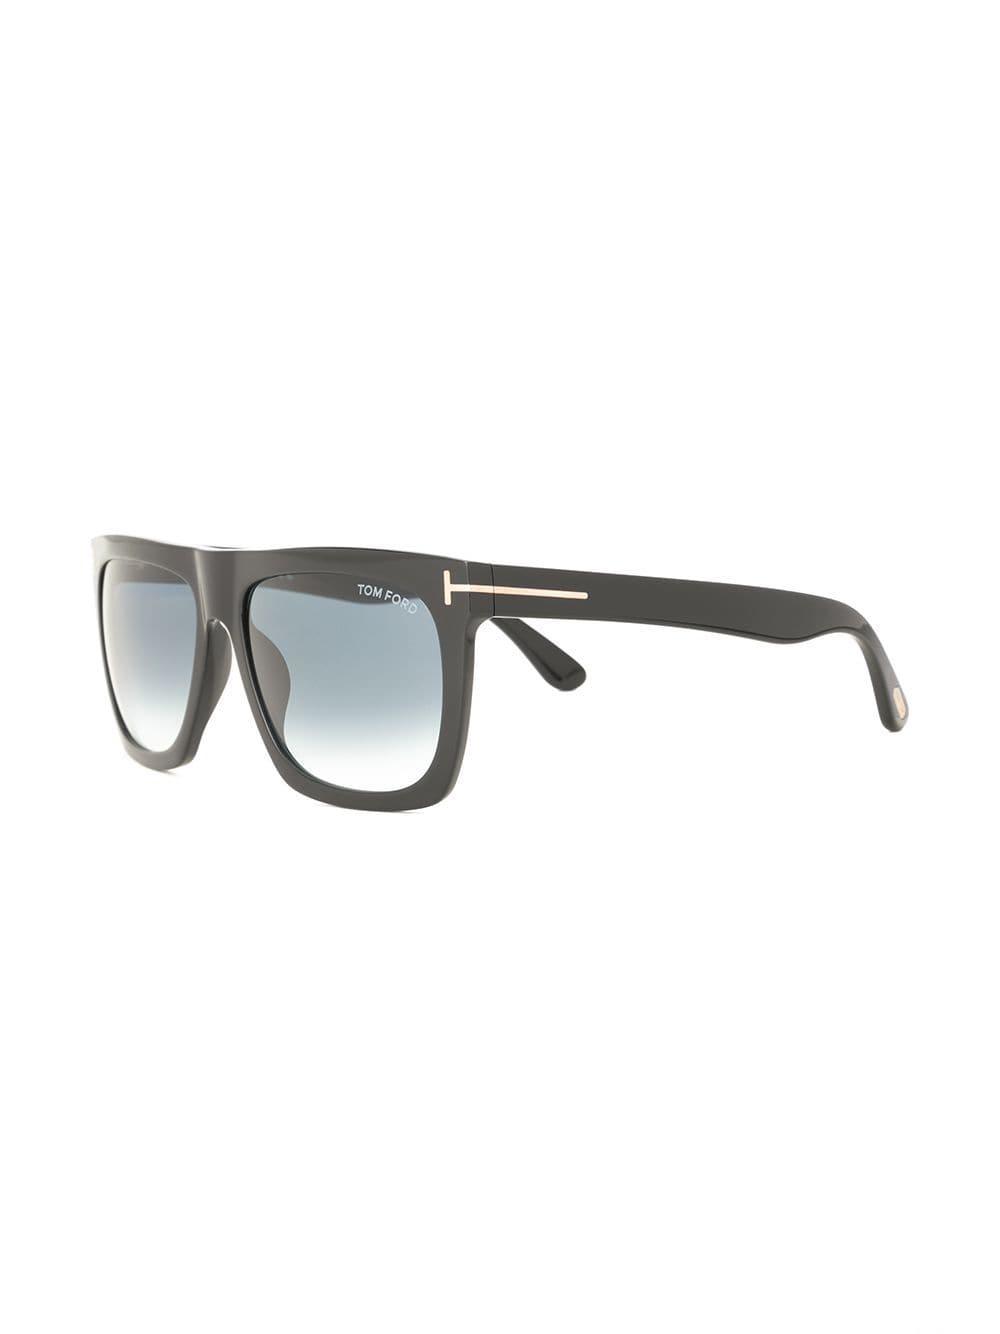 ca0aae2b00a Tom Ford - Black Square Frame Sunglasses - Lyst. View fullscreen